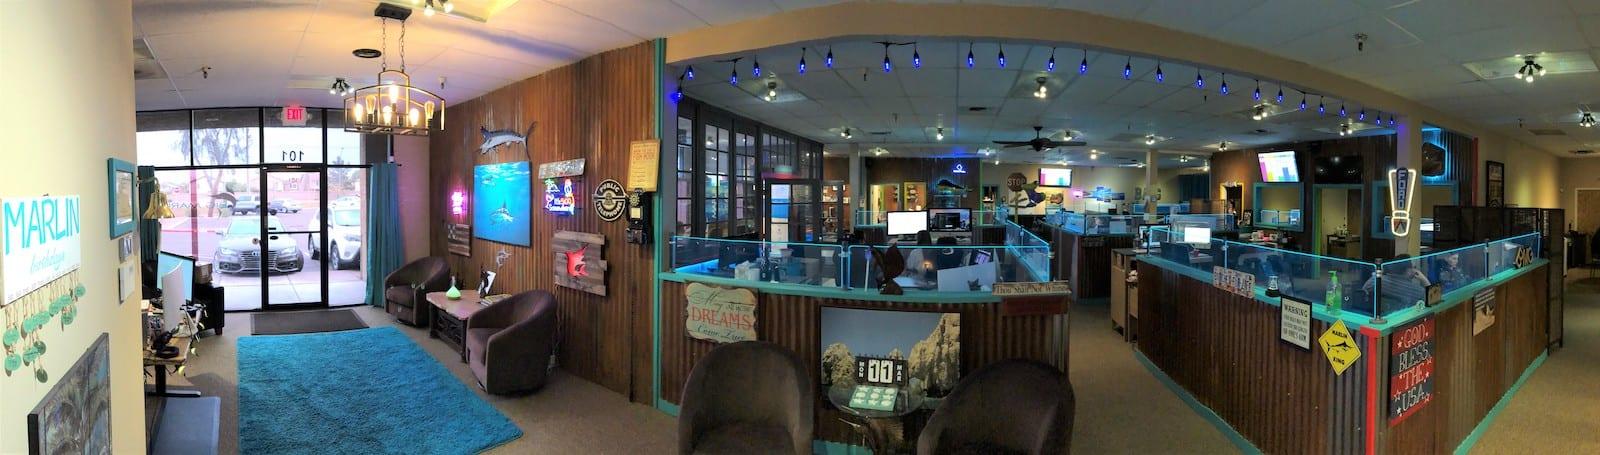 Big Marlin Group Office | Gilbert, AZ Marketing Agency